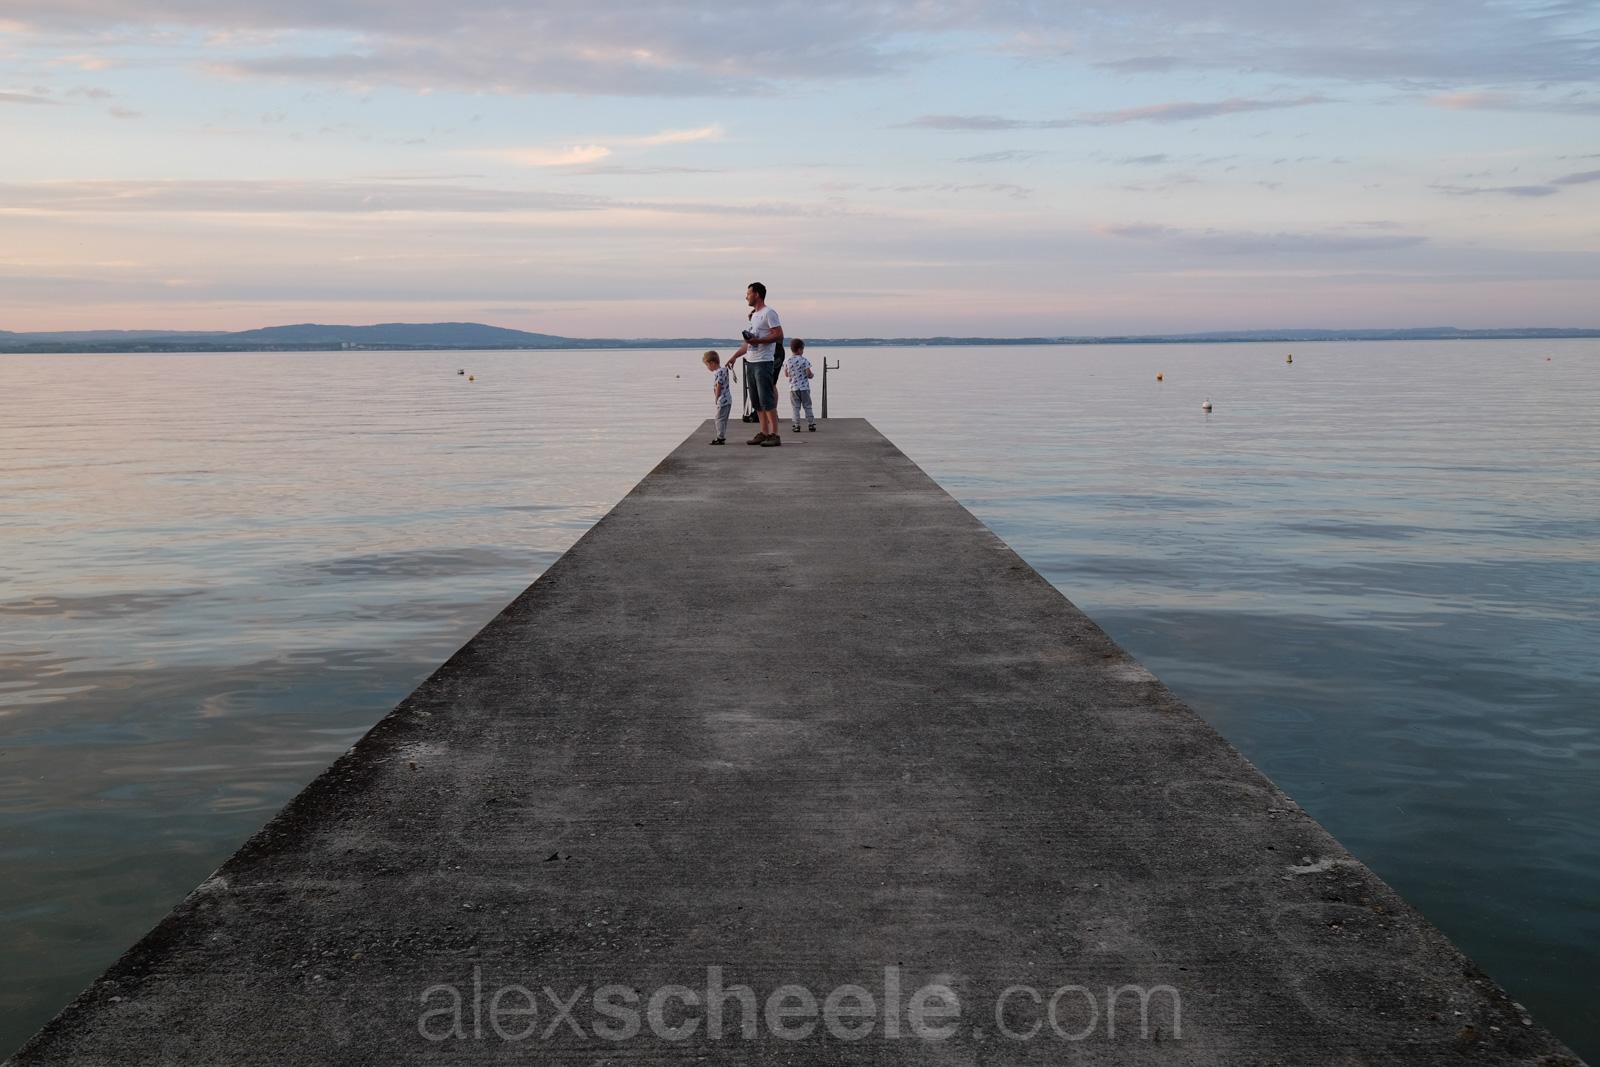 Lake Constant © alexscheele.com